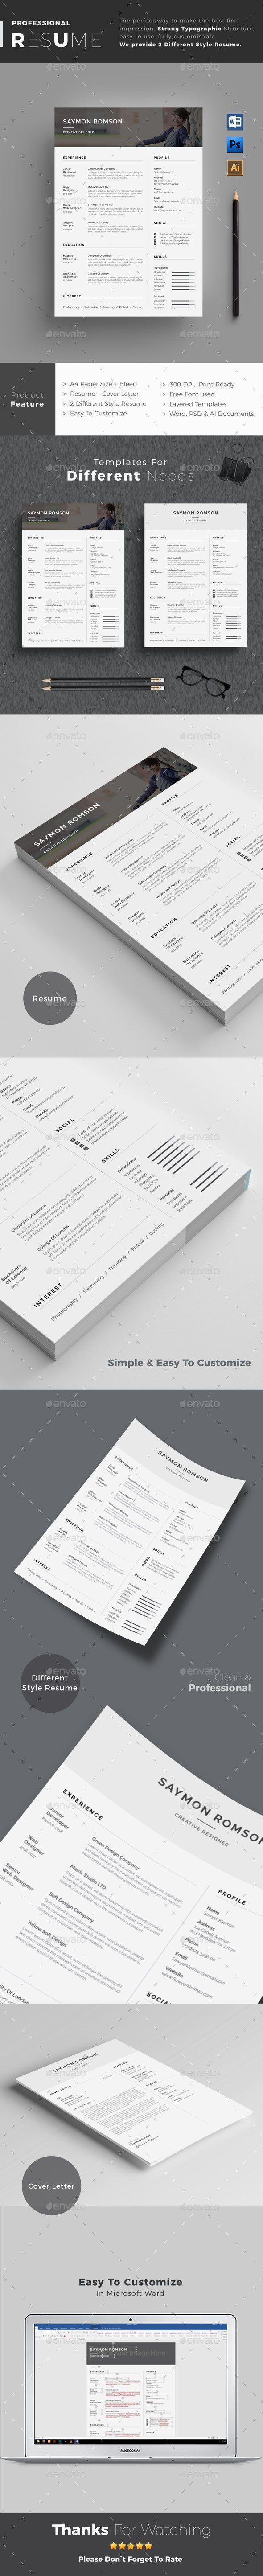 matrimonial resume format%0A Best     Cv format in word ideas on Pinterest   Creative cv template  Cv  template and Layout cv